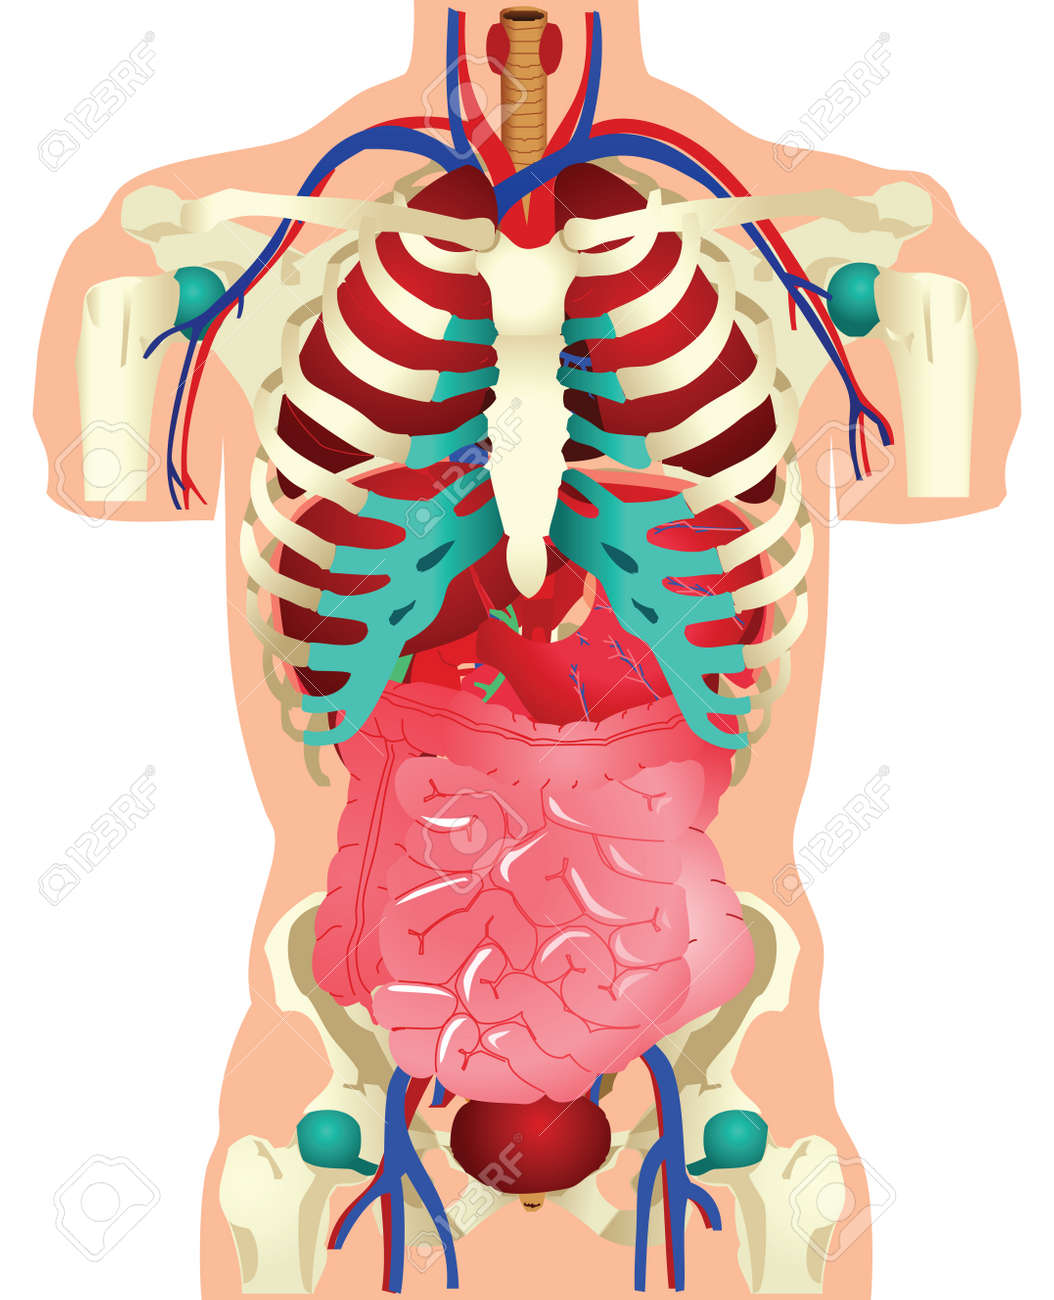 Stock illustration of human organs. Stock Vector - 10477794